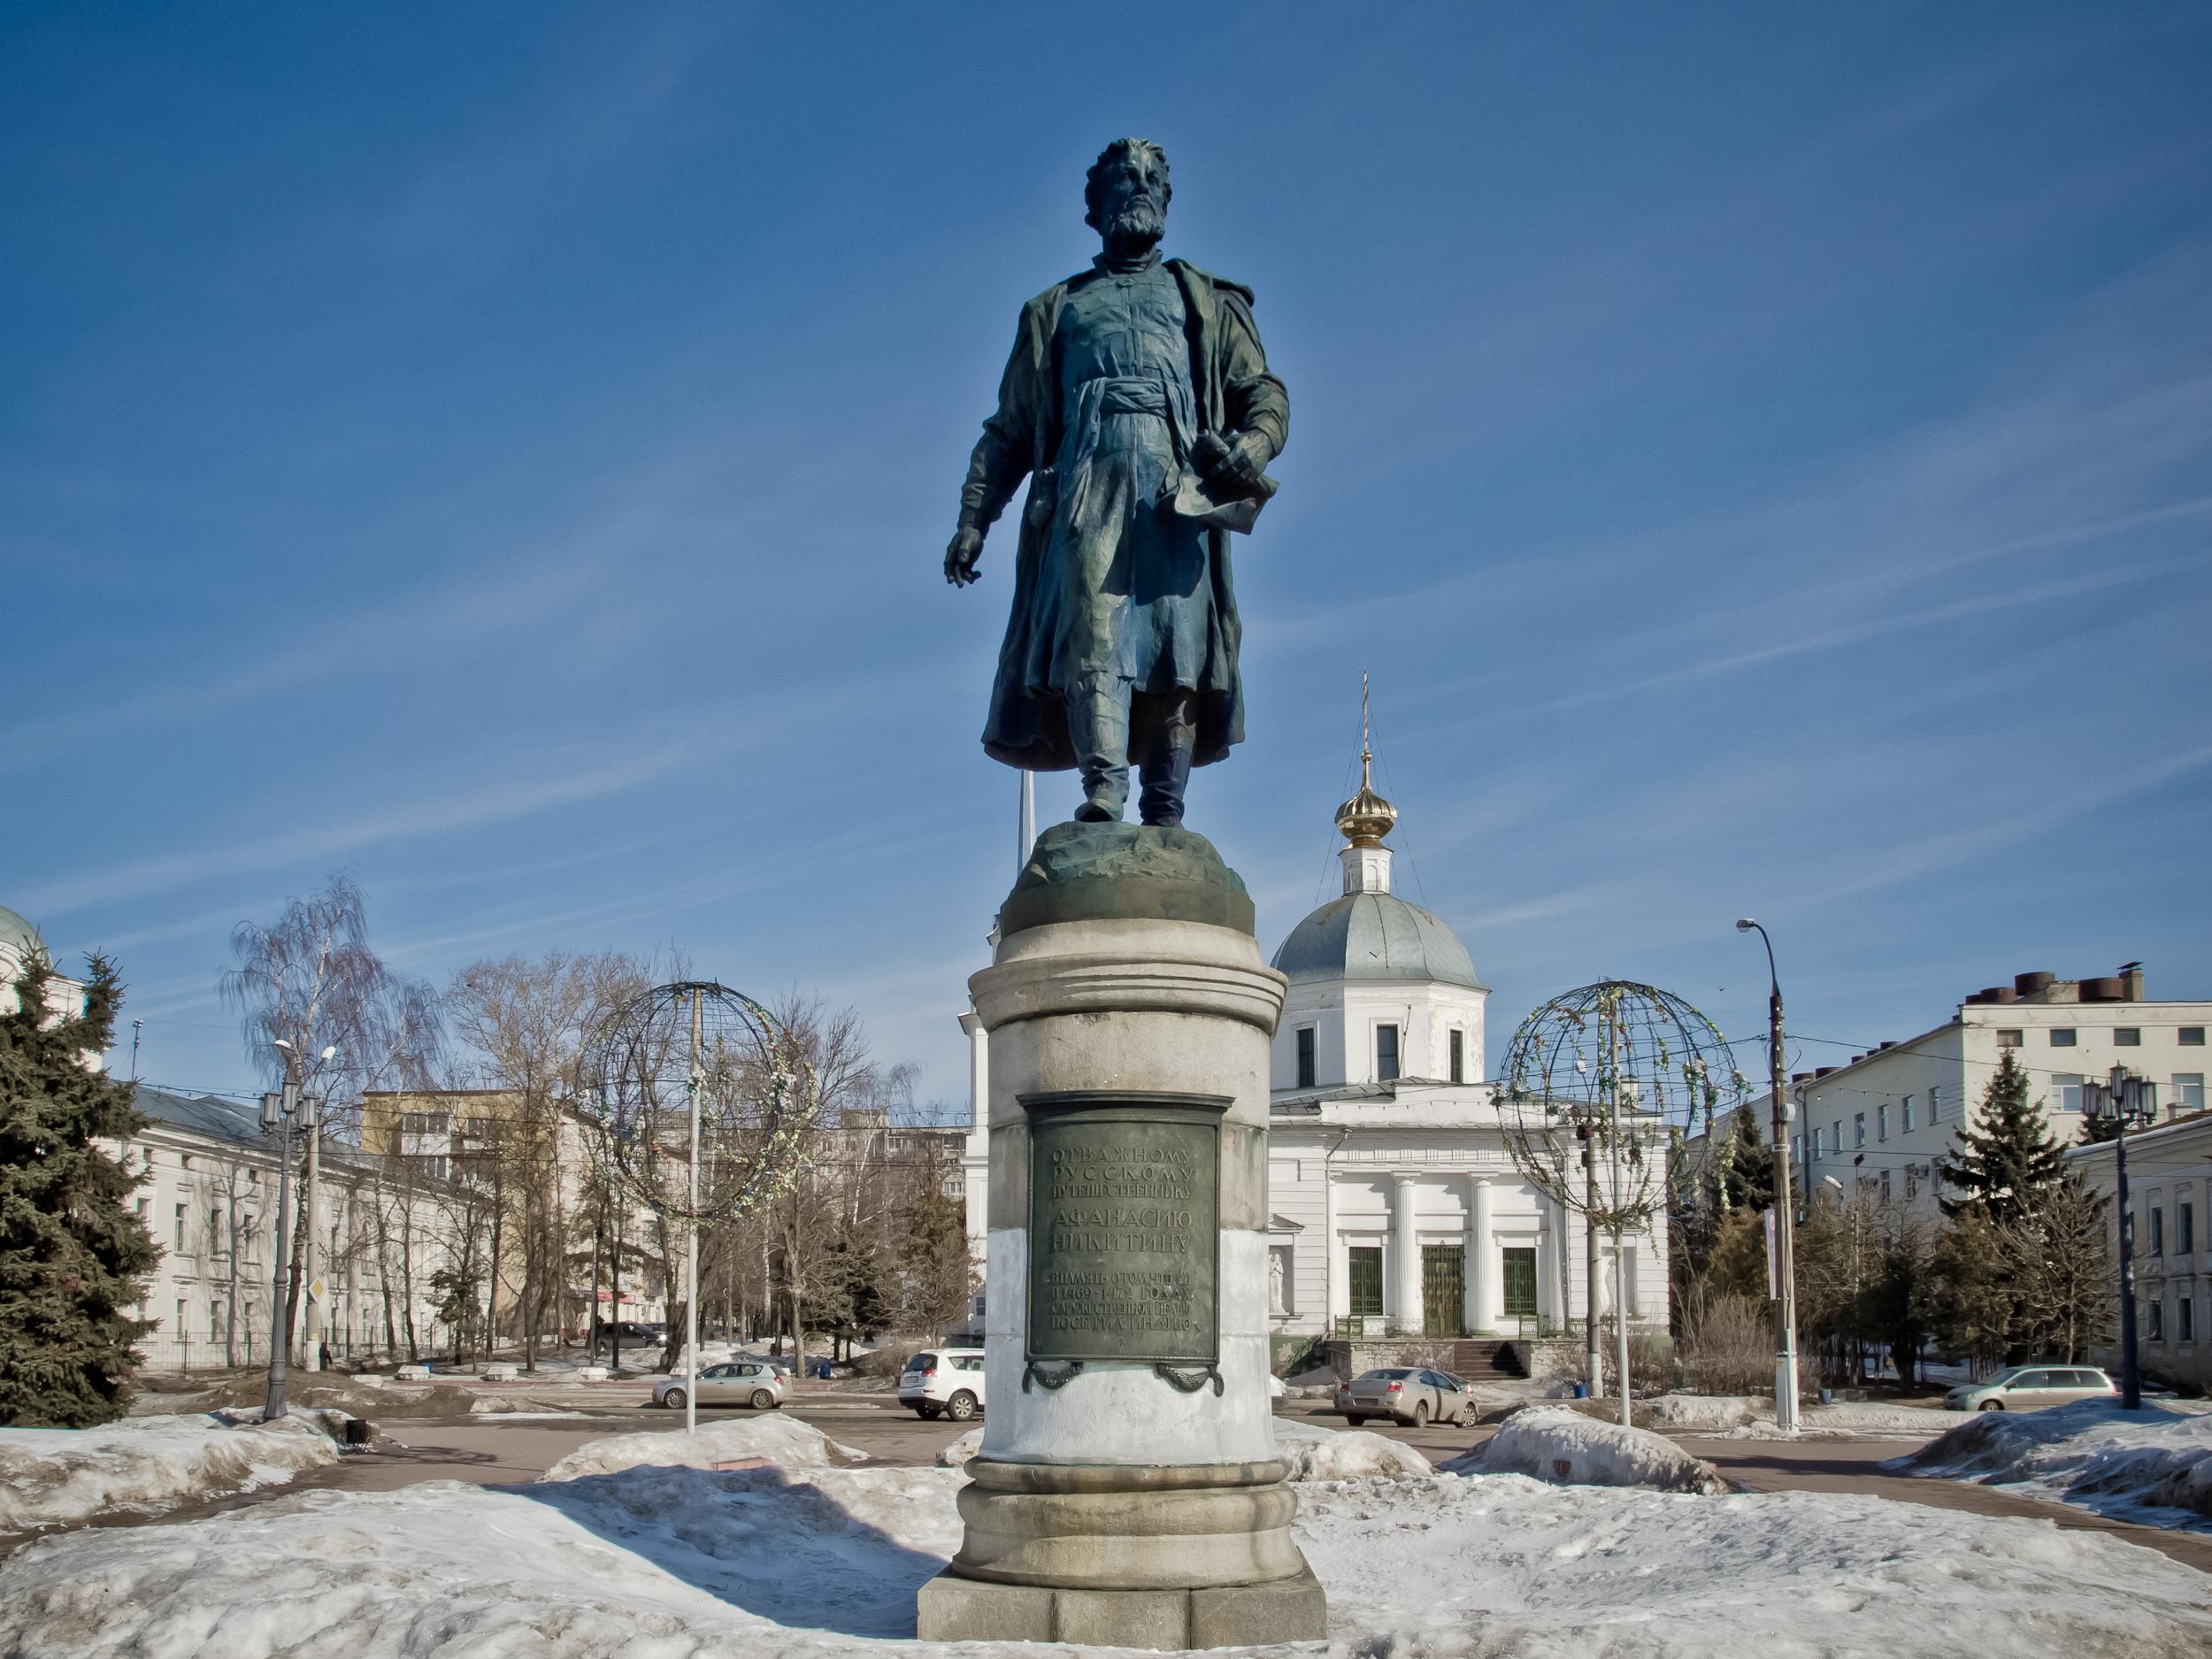 Monument to Afanasy Nikitin in Tver.